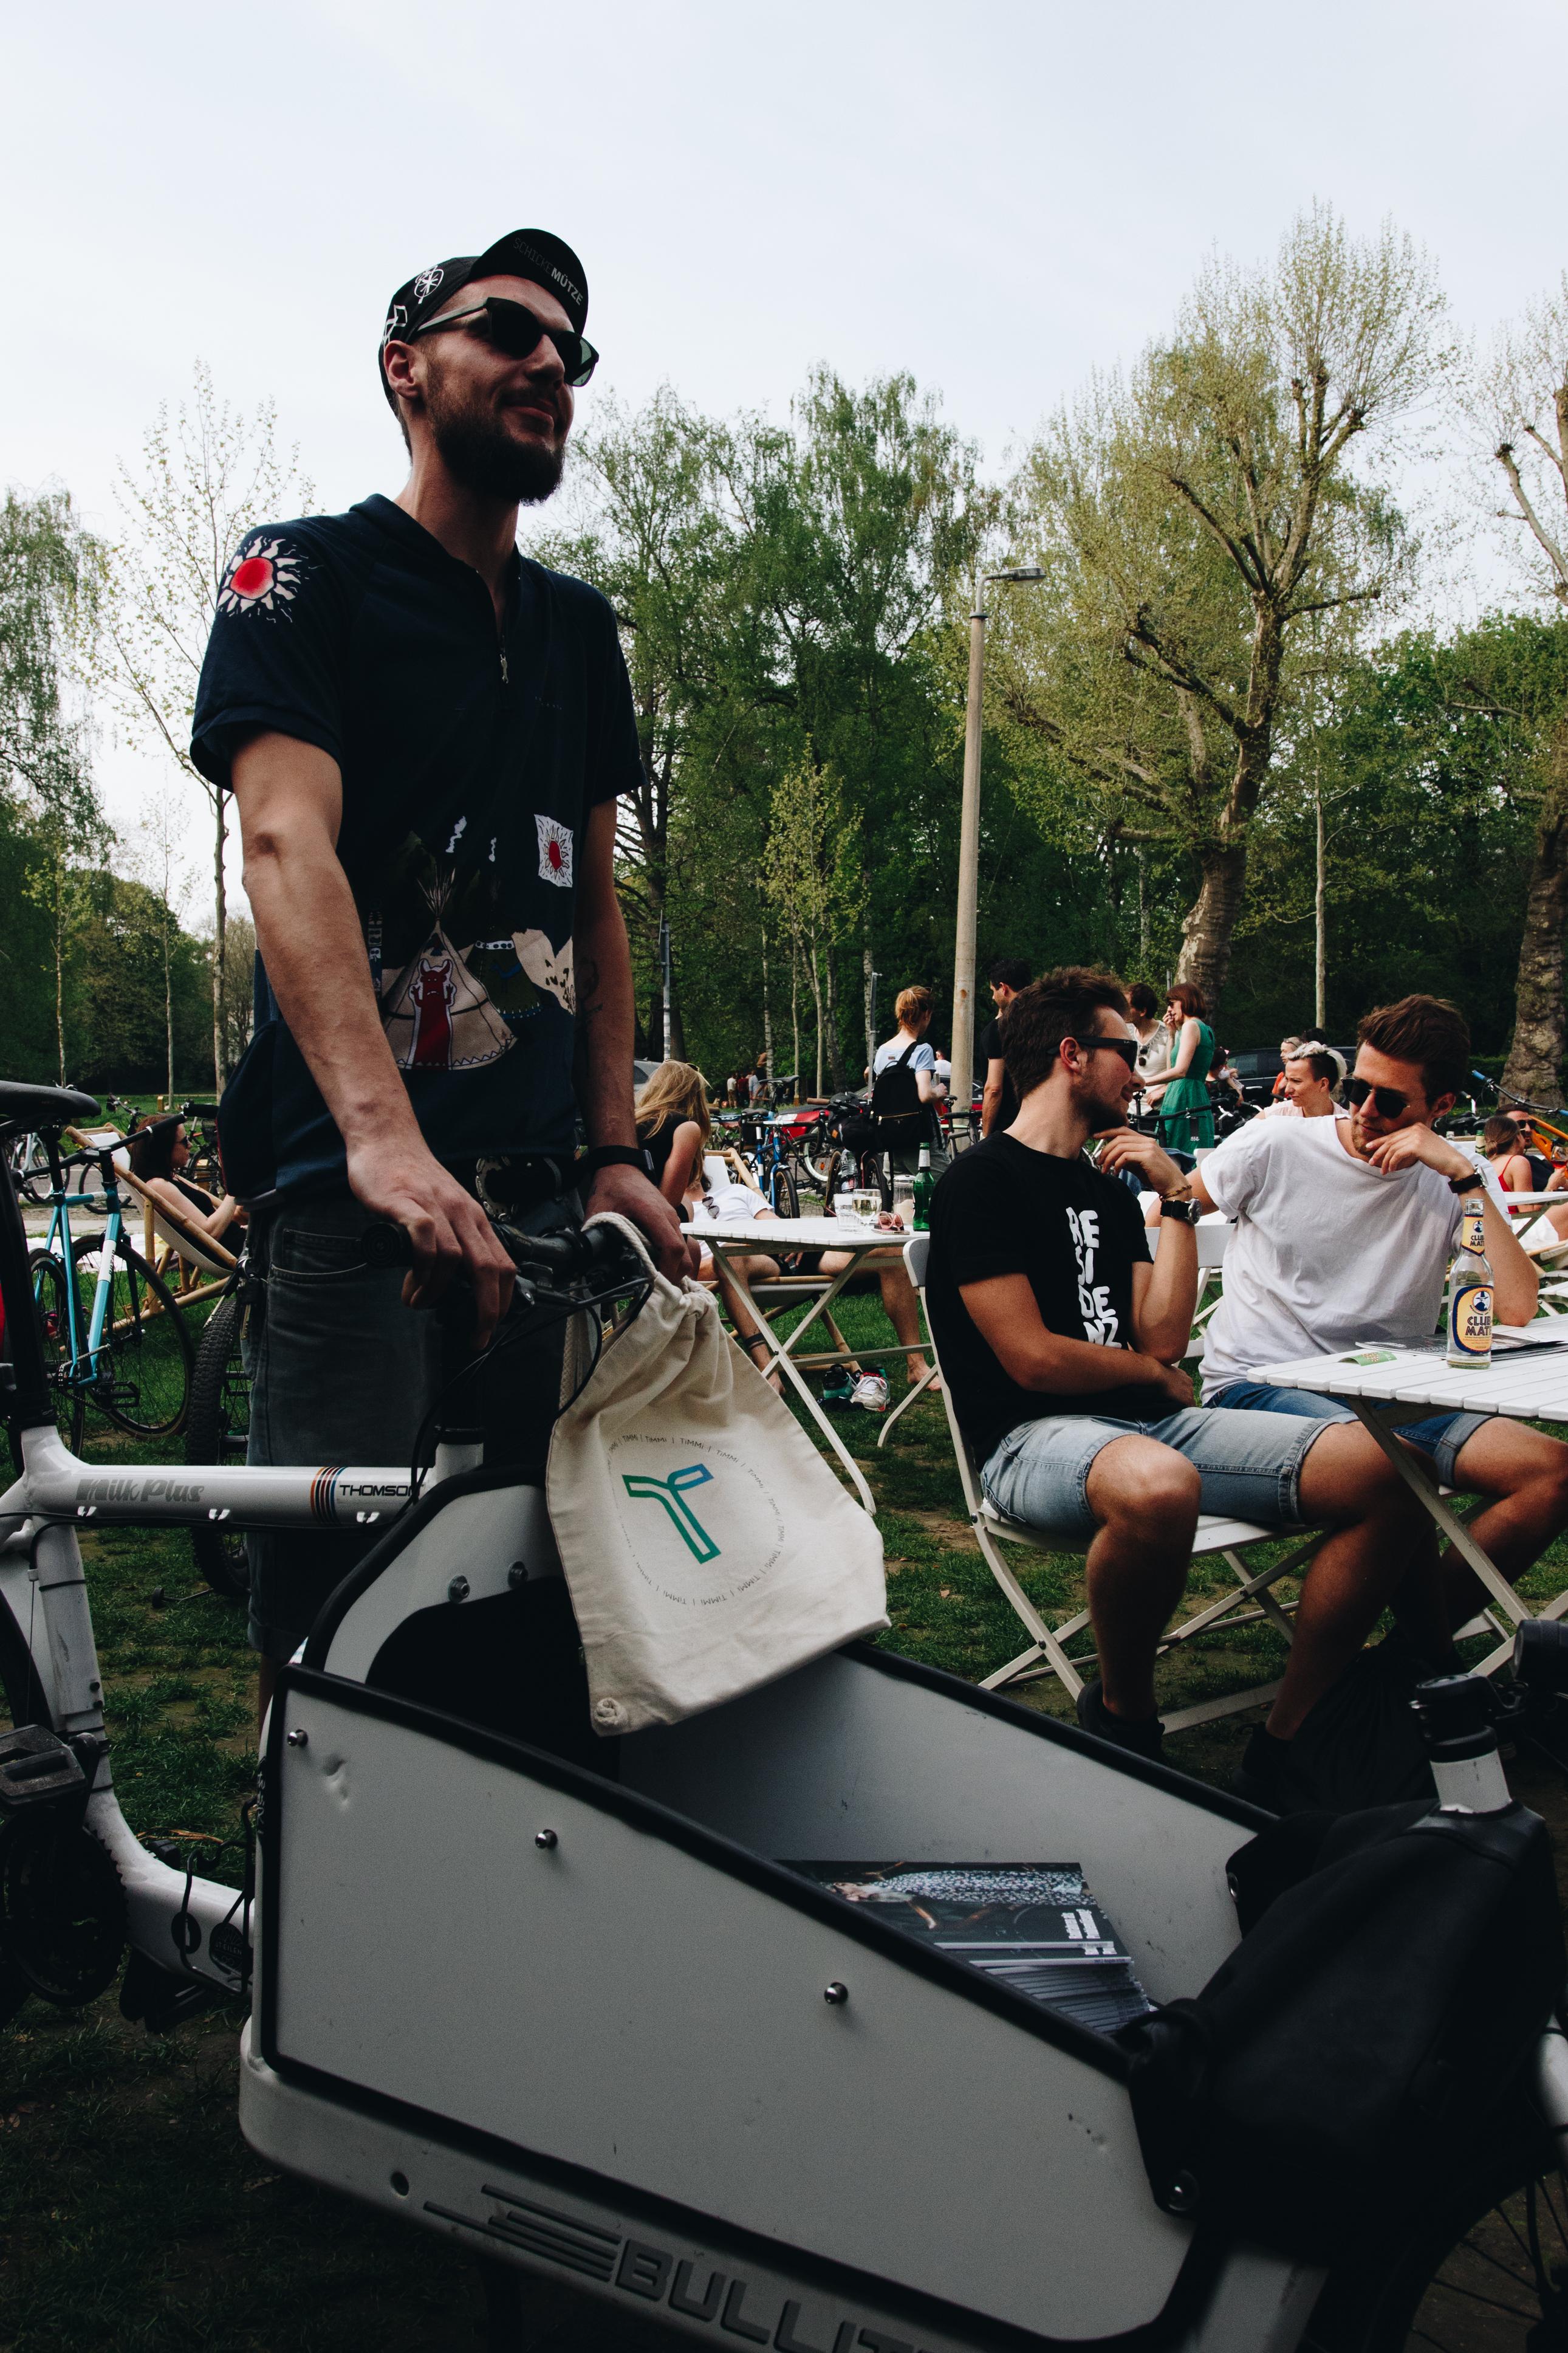 we ride leipzig-release party-leipzig-cafe bau bau-annabelle sagt12